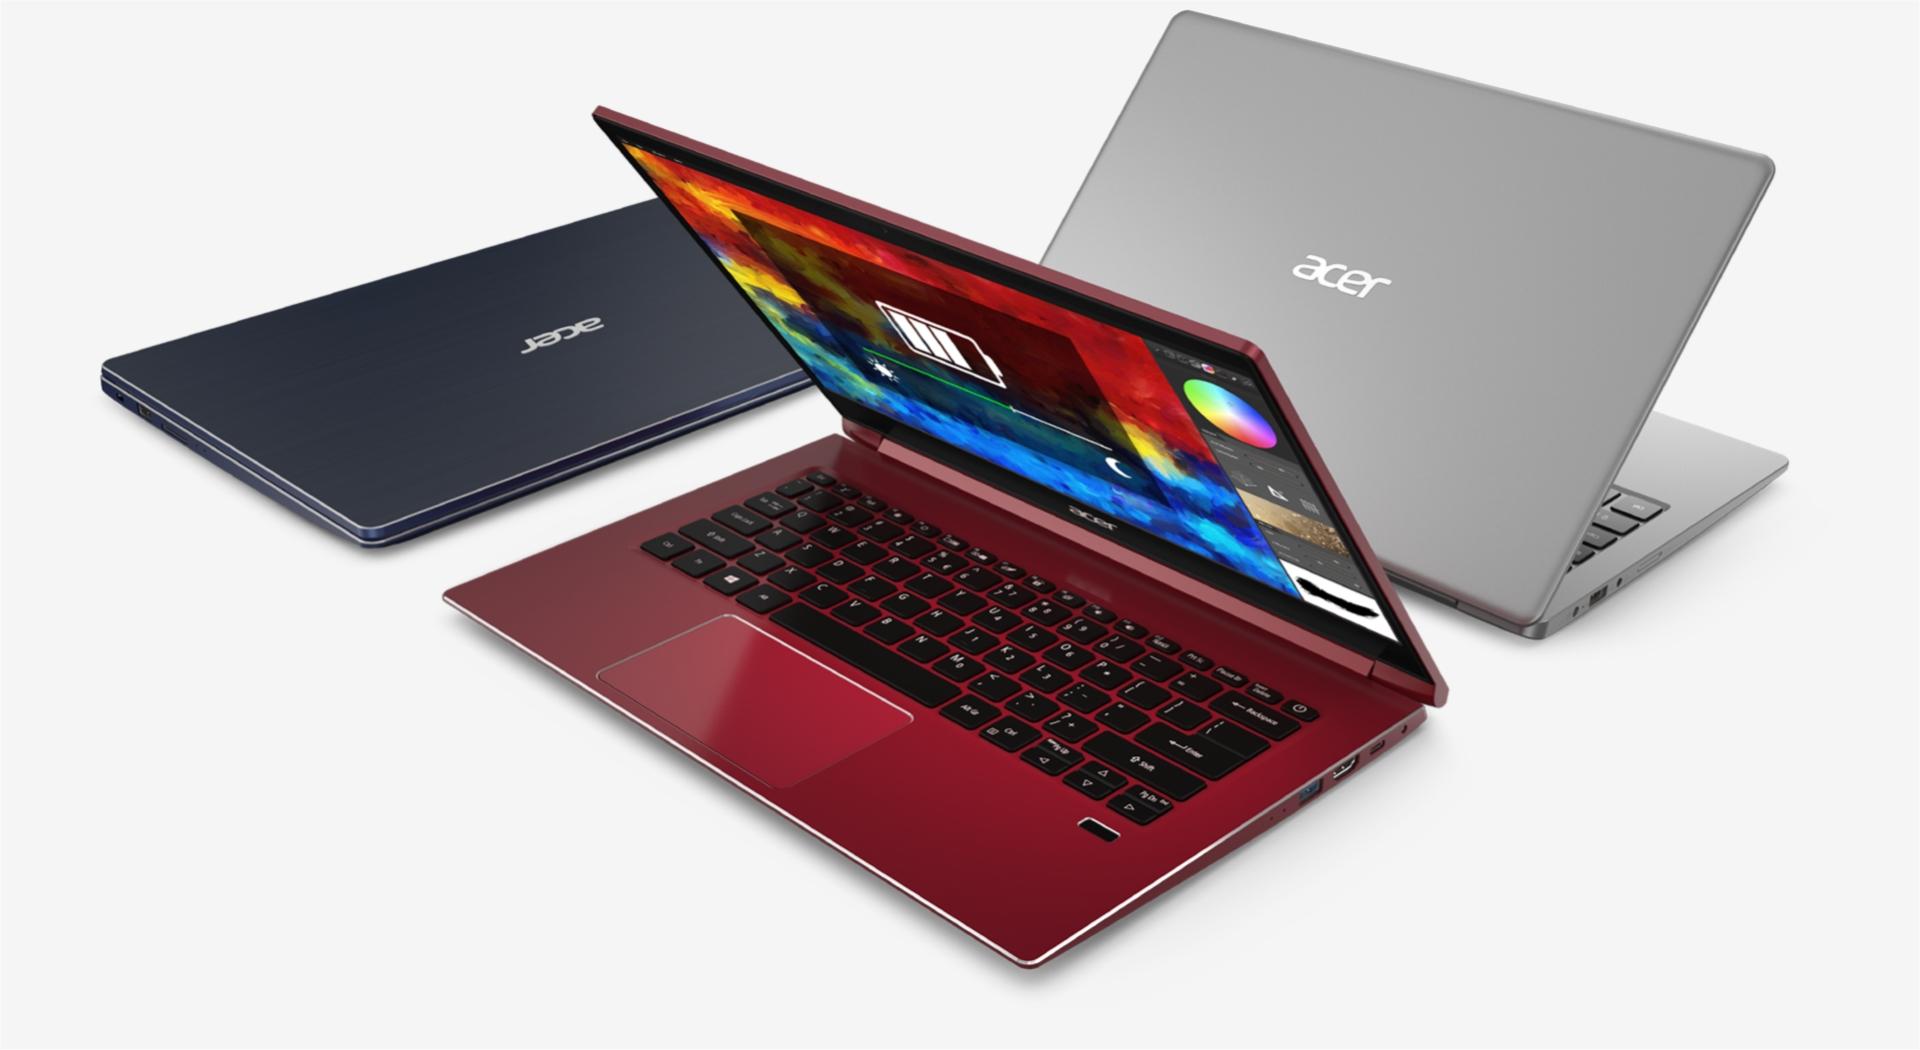 Notebook Acer Swift น้ำหนักเบาพกพาสะดวก Advice Promotion เหลือเพียง 12,790฿